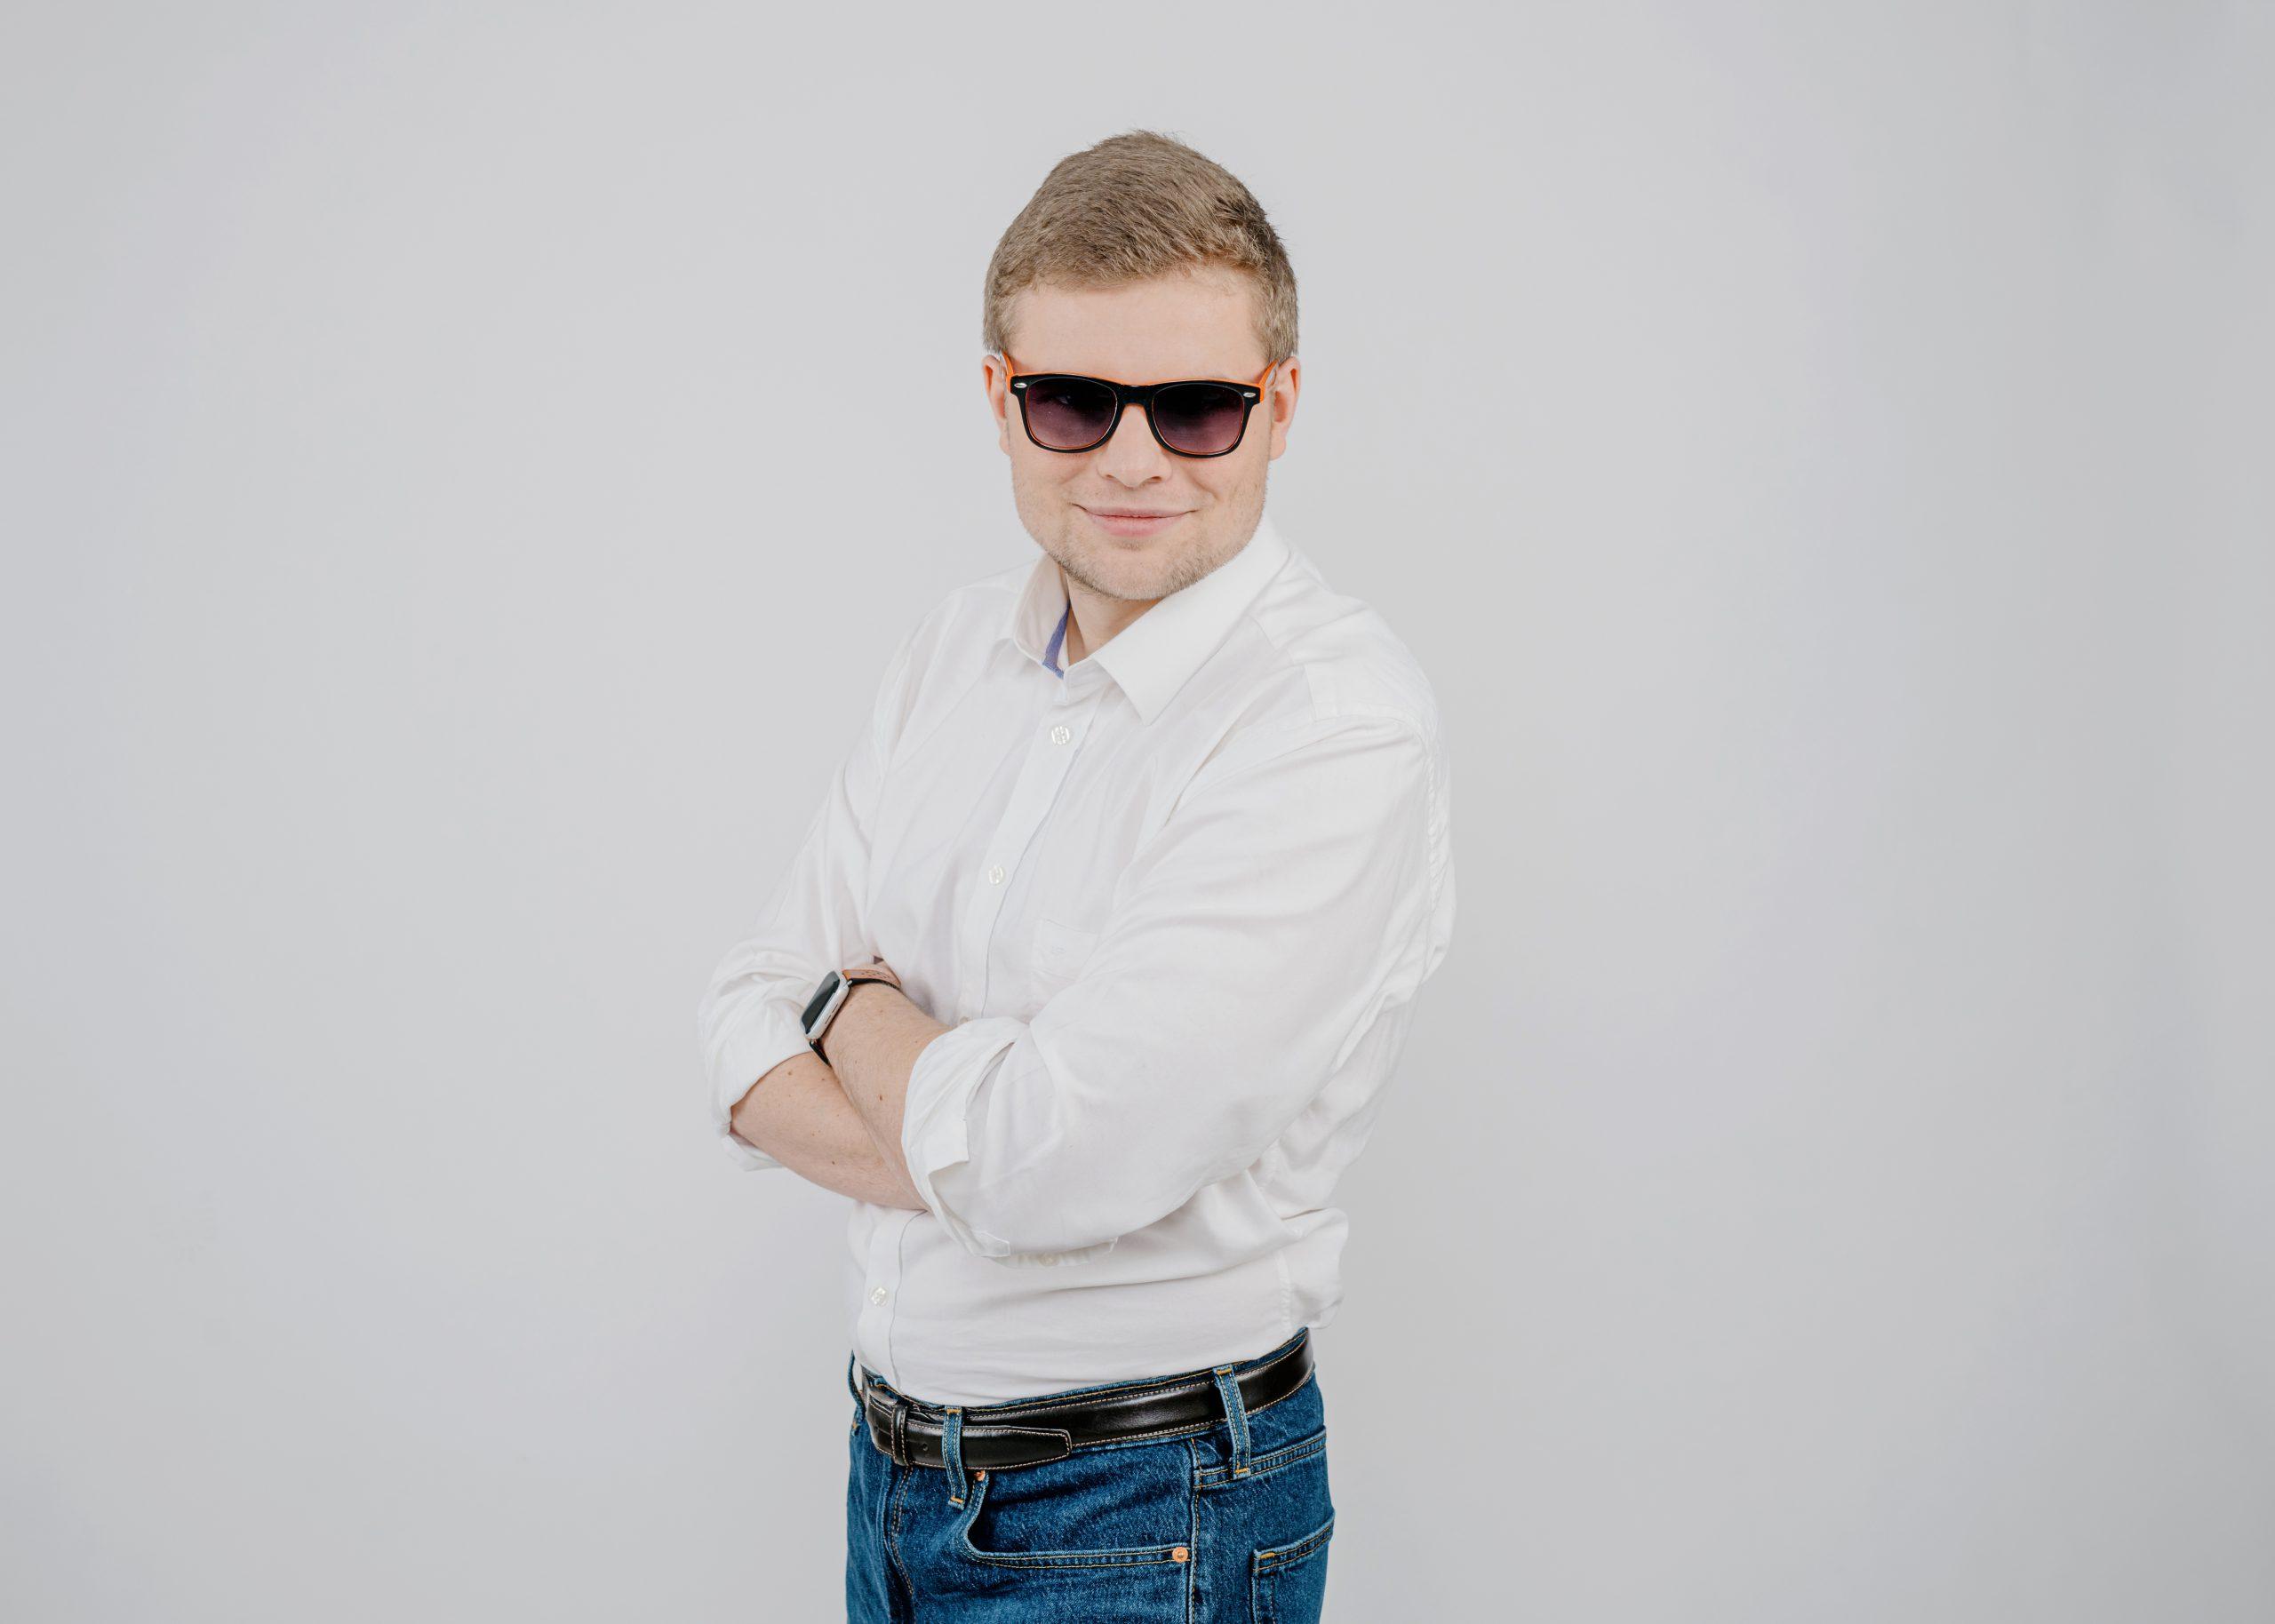 Wojciech Reguła